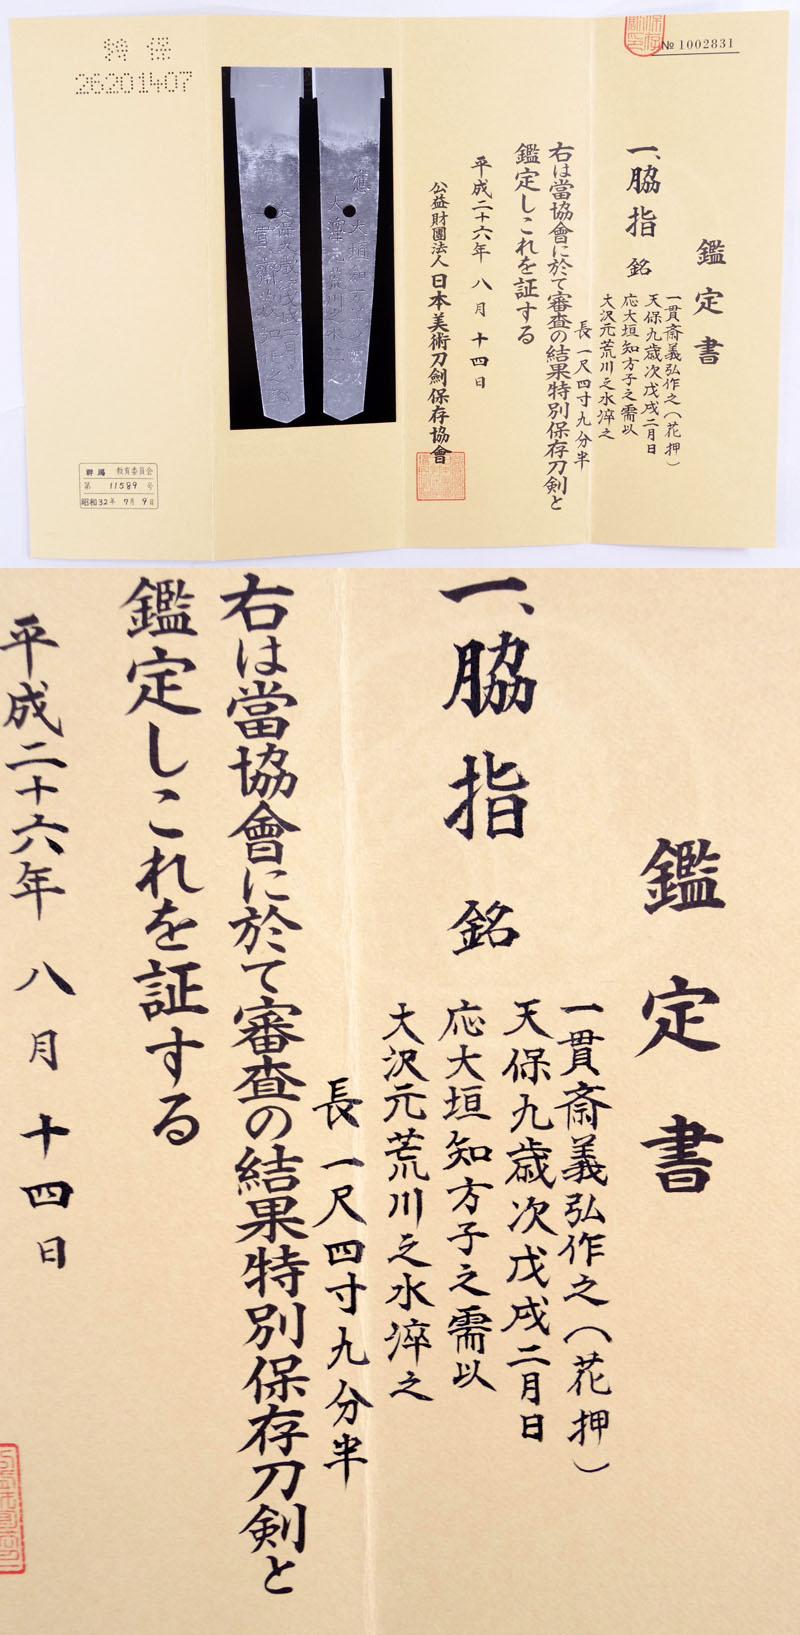 1貫斎義弘作之(花押) Picture of Certificate